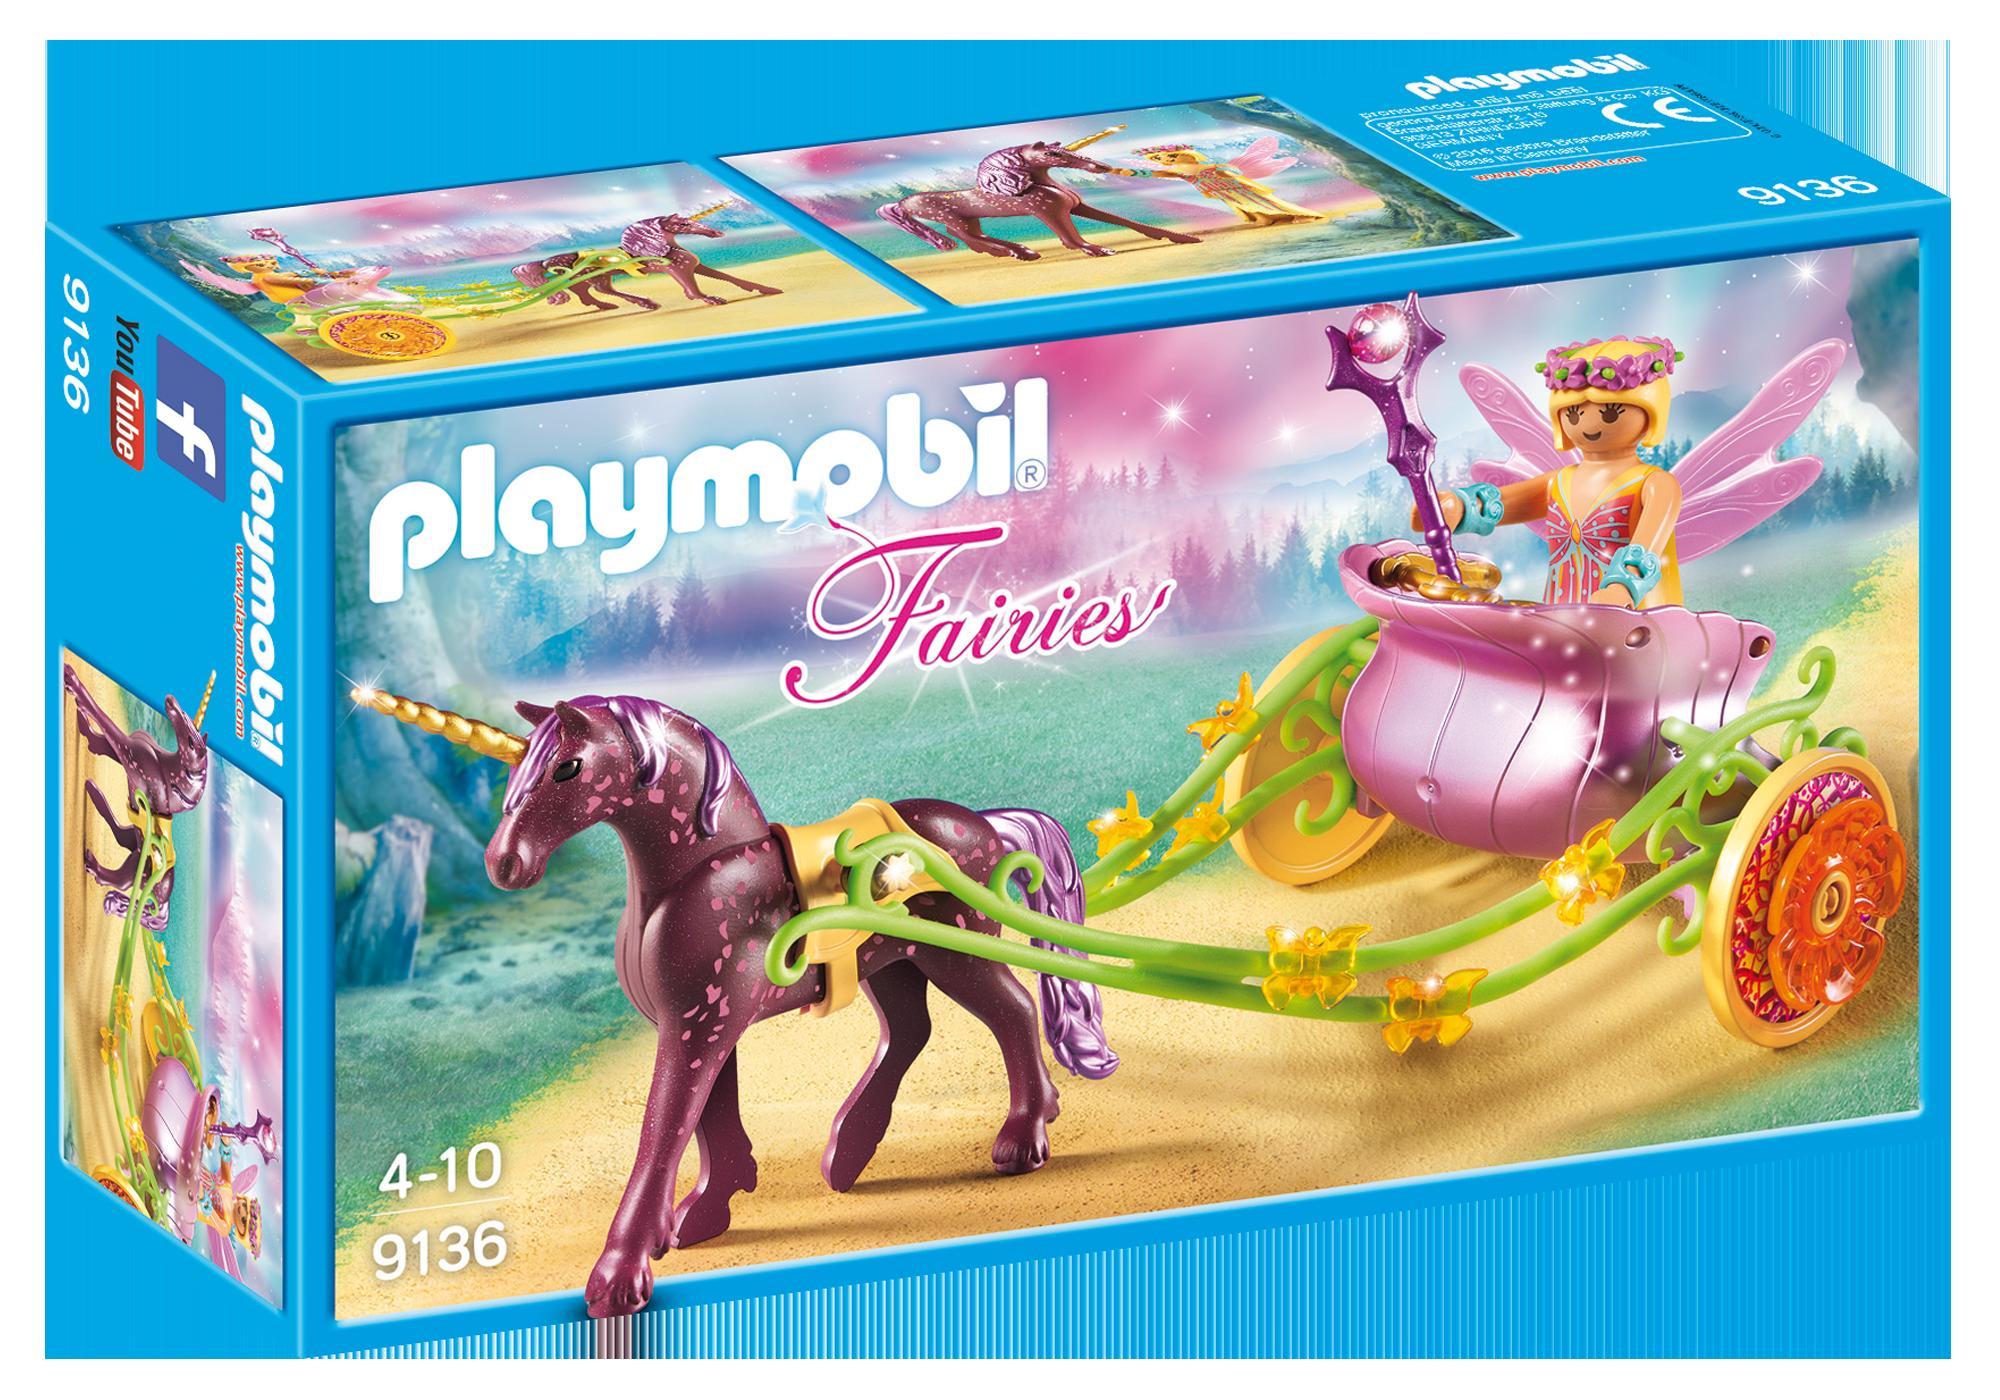 http://media.playmobil.com/i/playmobil/9136_product_box_front